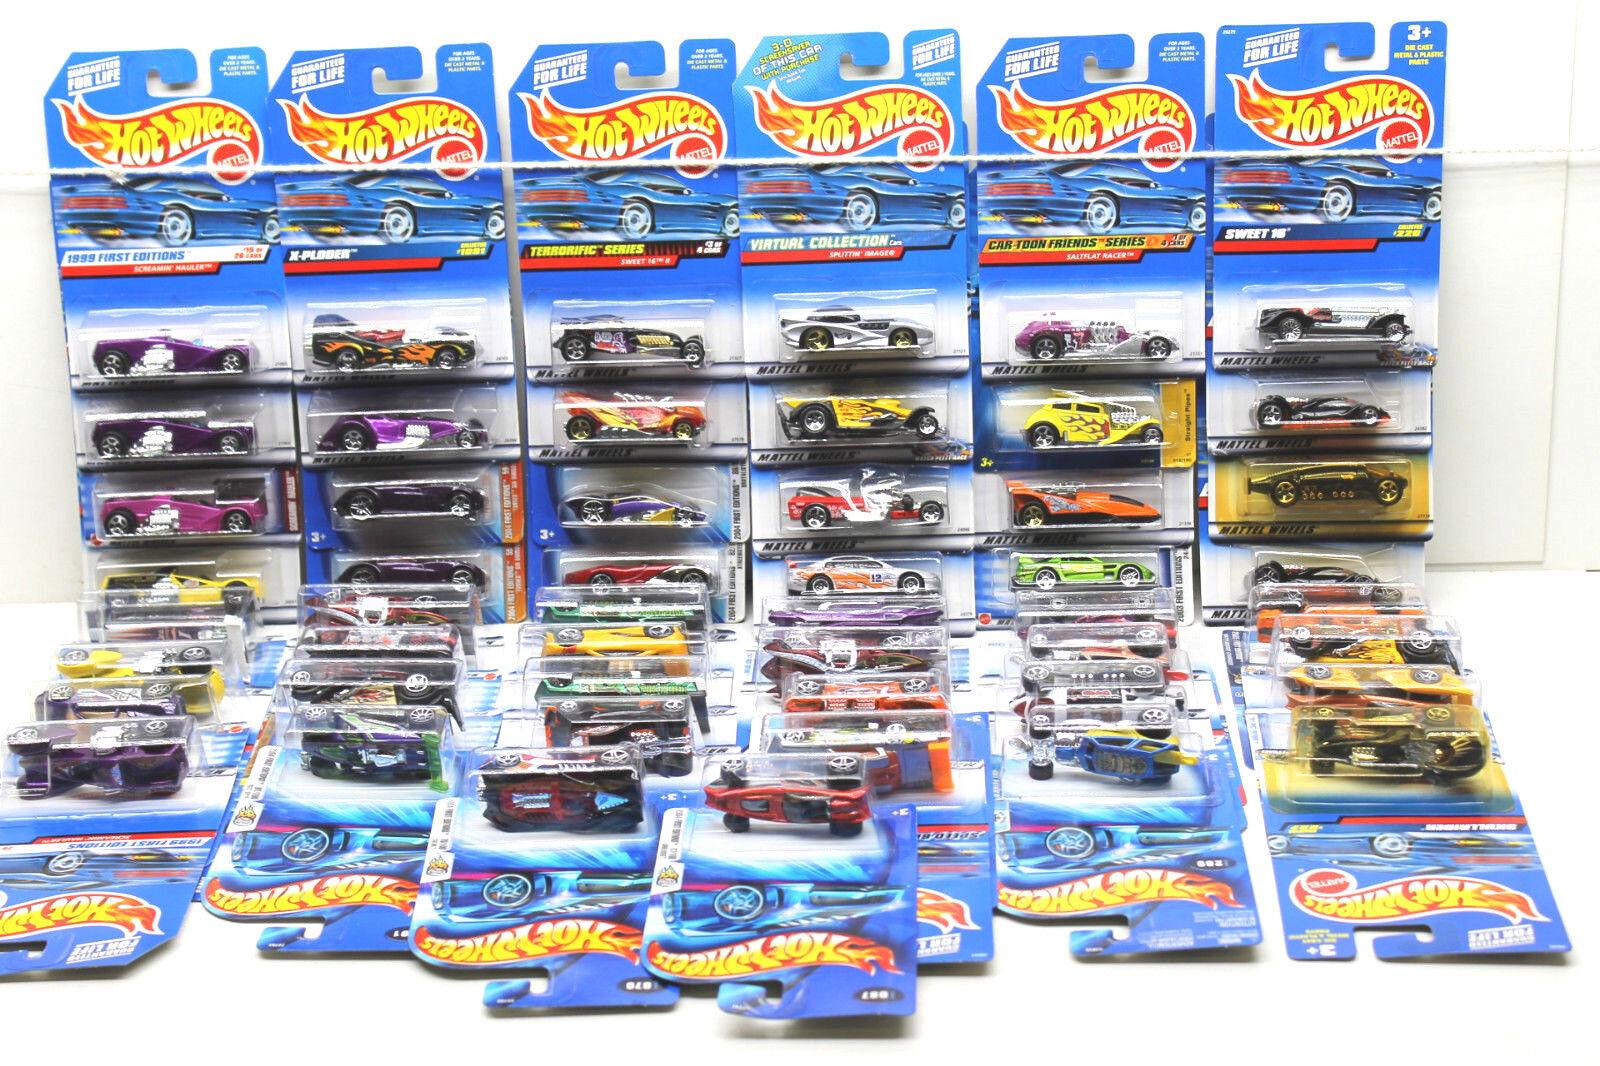 50 pc Hot Wheels Ford Die Cast Car Lot Concept+Futuristic 1998 - 2003 Mattel NOC